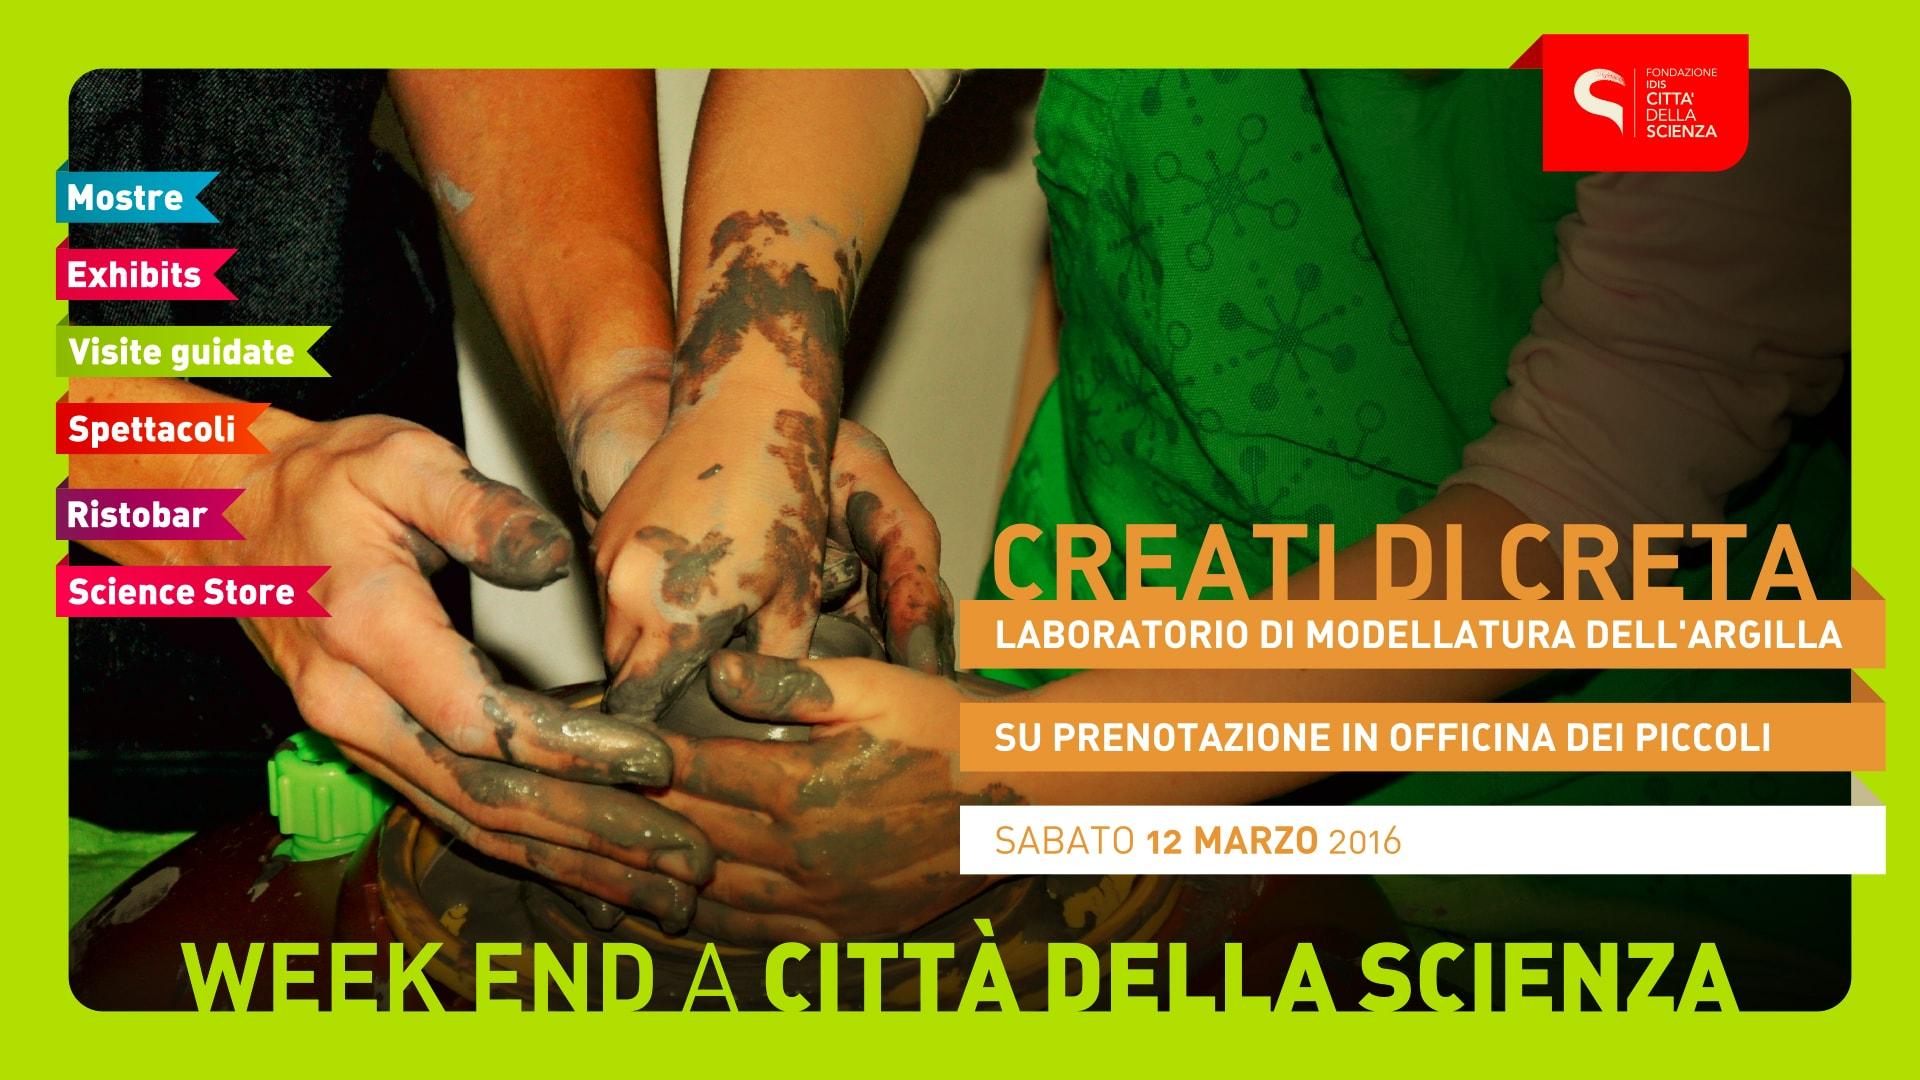 CREATI_DI_CRETA_1920_x_1080-min